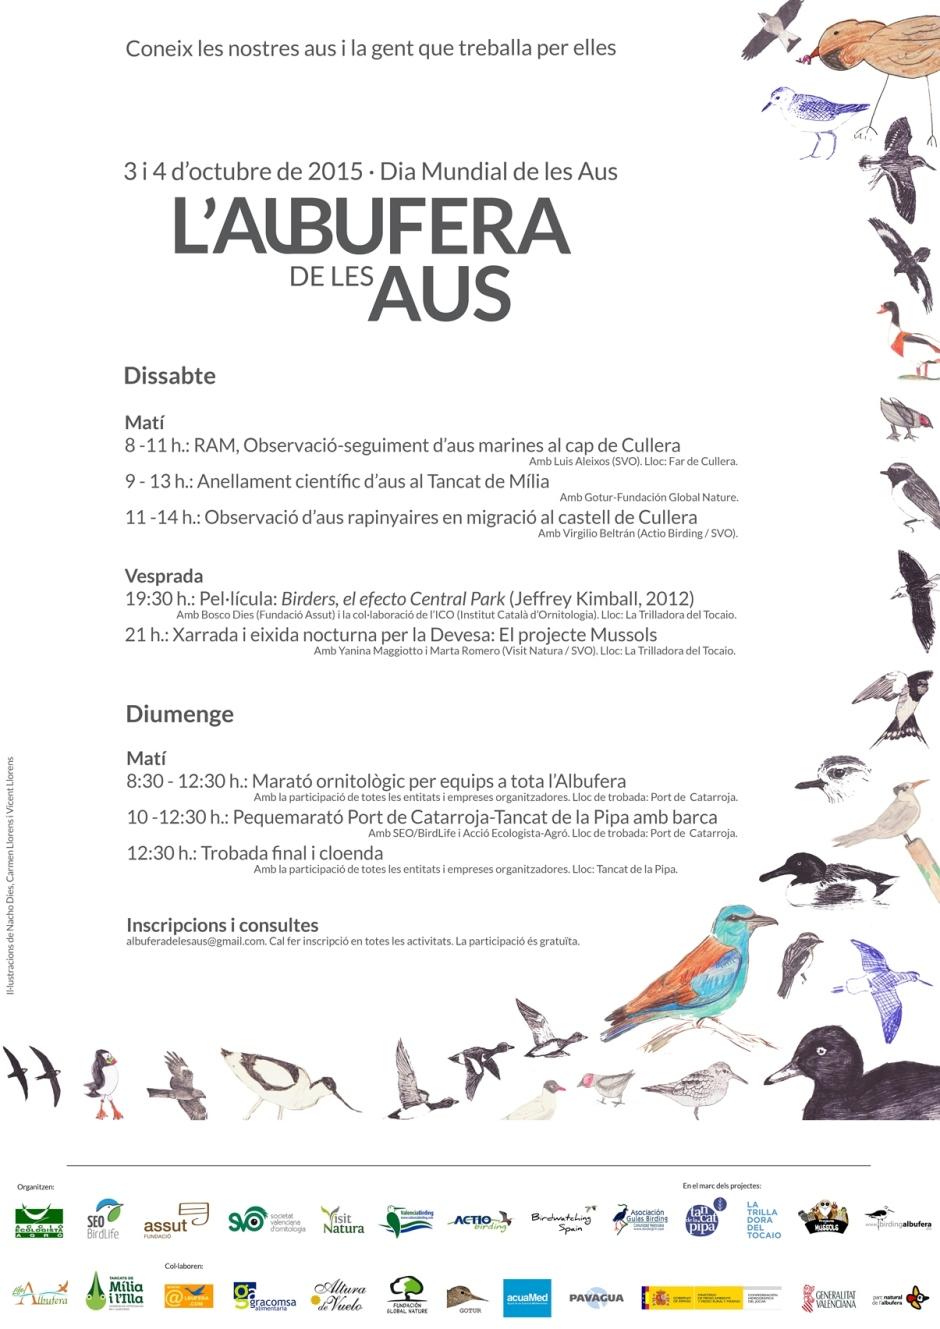 Programa L'Albufera de les Aus 2015